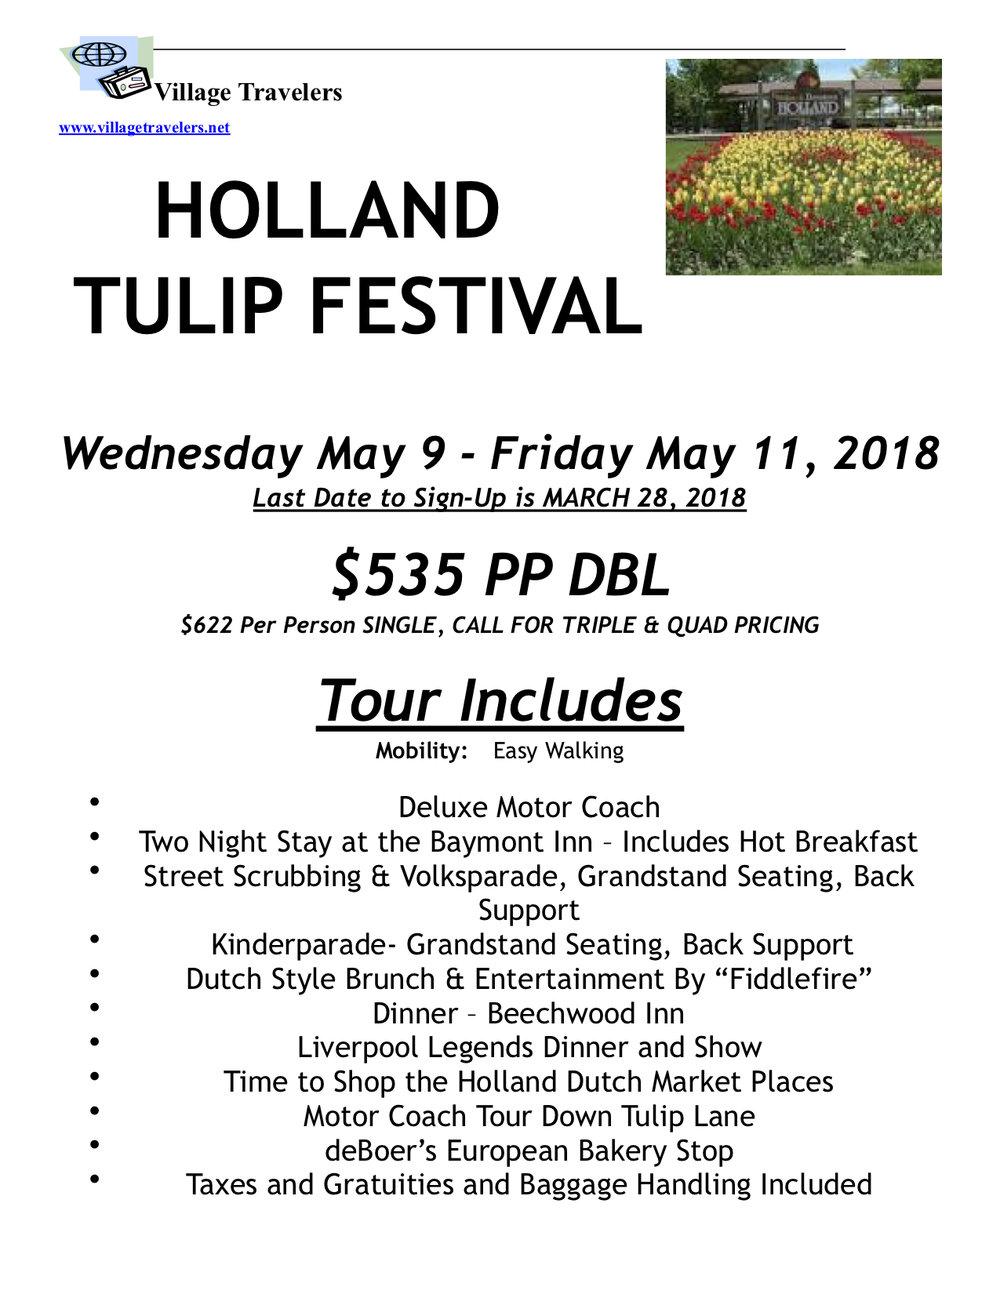 Holland tulip tours 2018